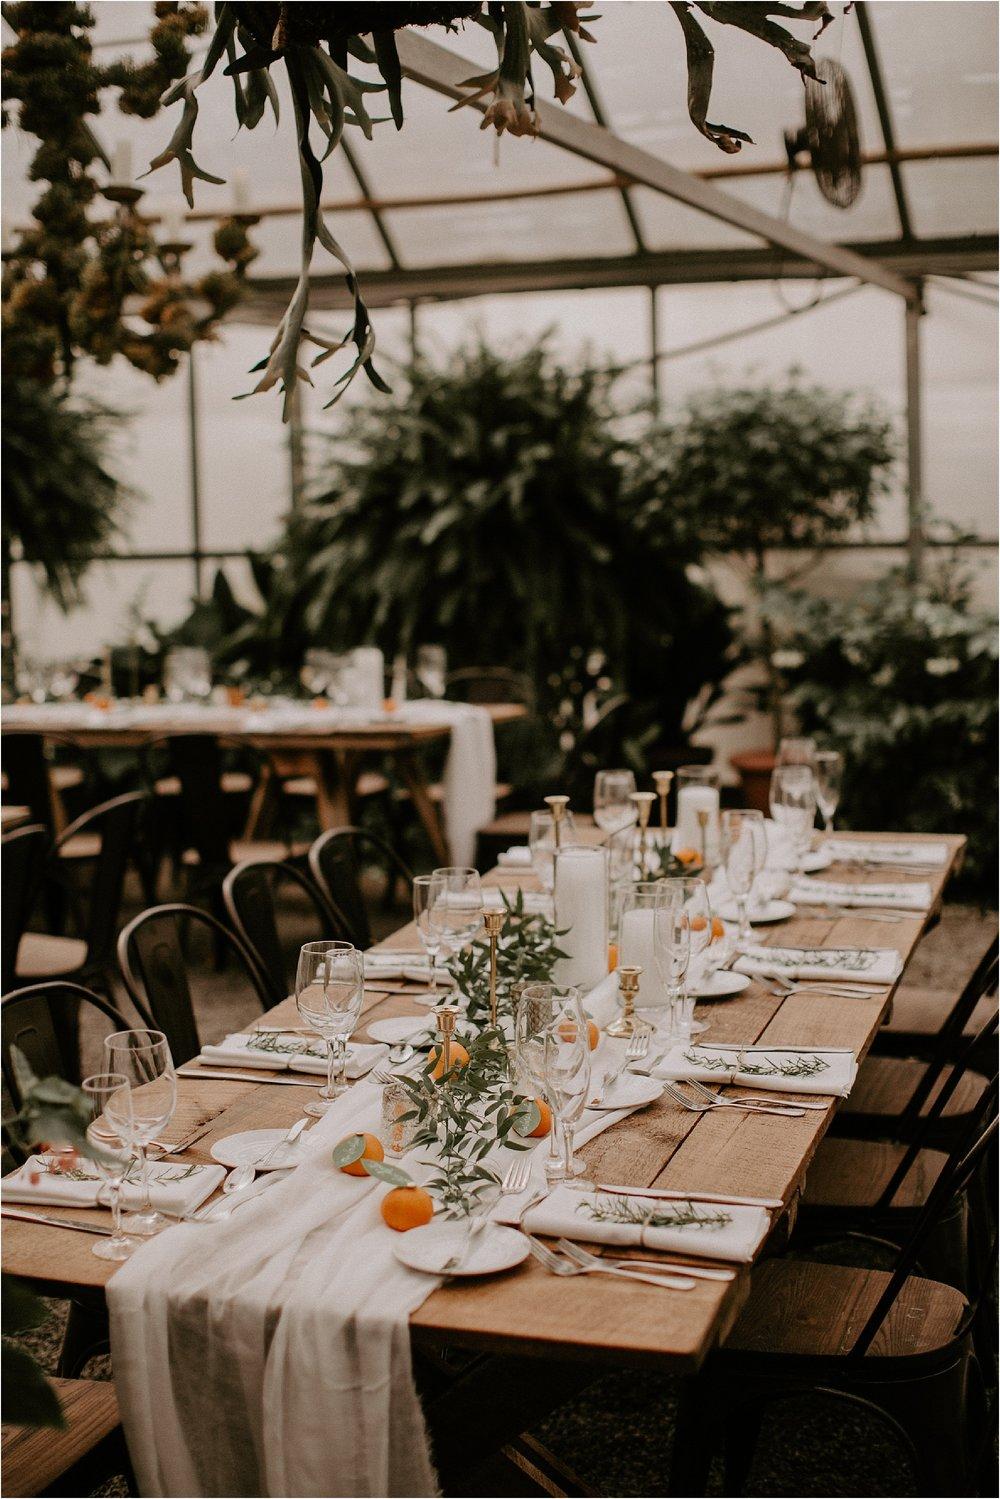 Sarah_Brookhart_Hortulus_Farm_Garden_and_Nursey_Wedding_Photographer_0058.jpg